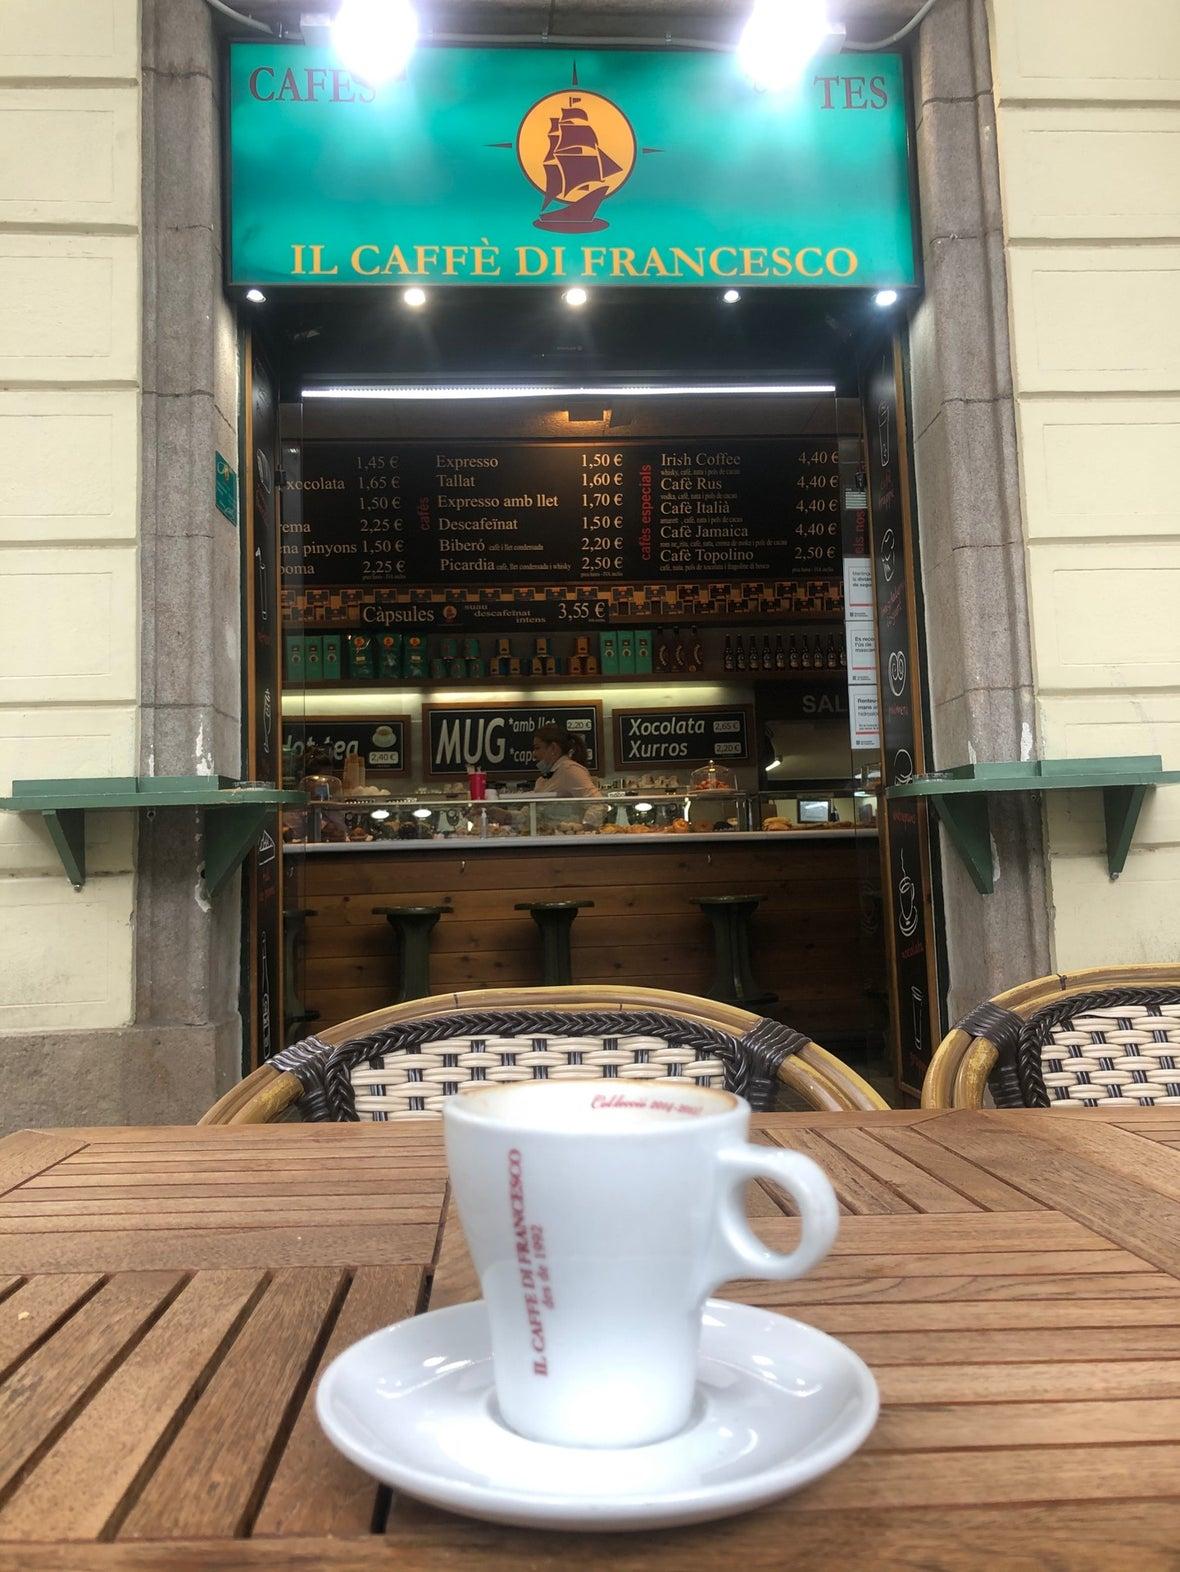 Il Caffè di Francesco